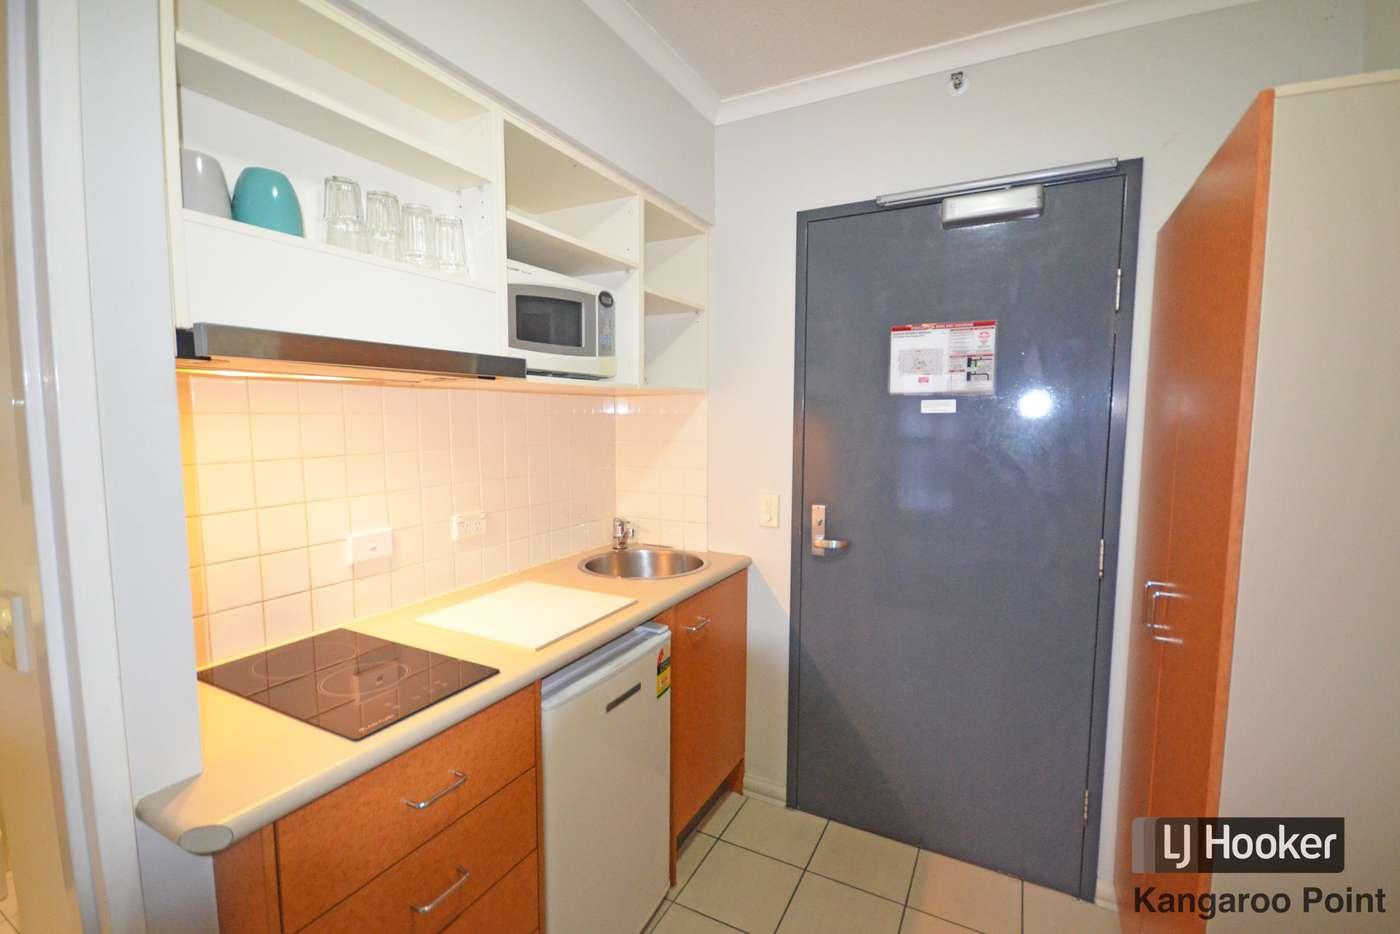 Main view of Homely studio listing, 903/9 Castlebar Street, Kangaroo Point QLD 4169